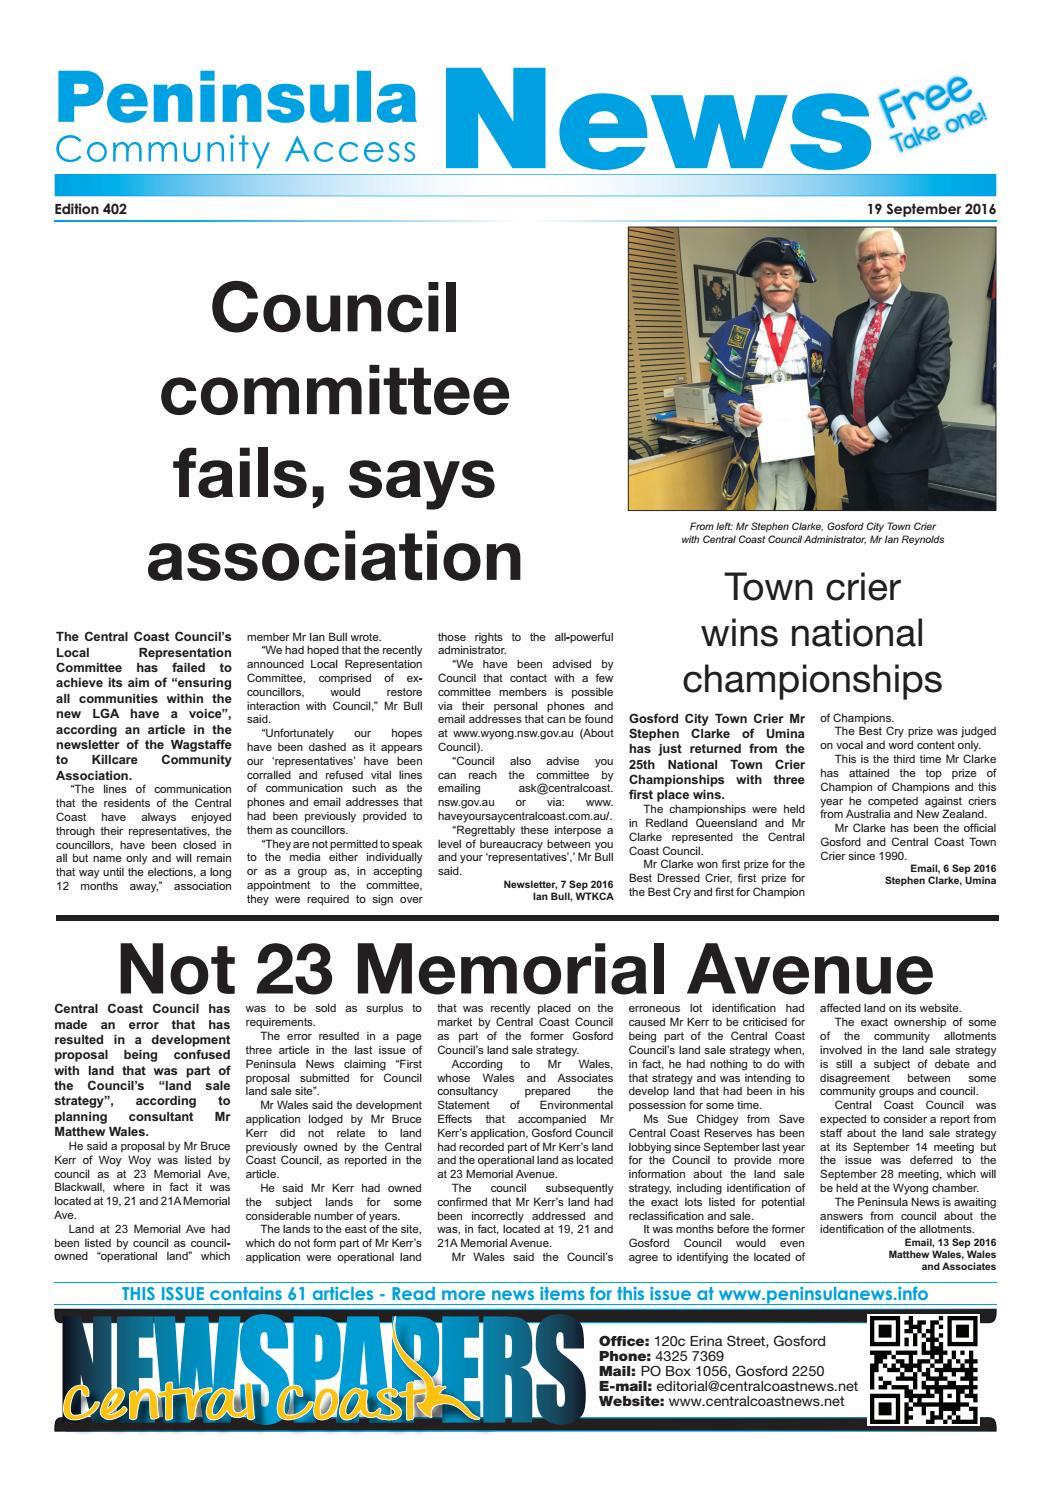 Peninsula news 402 by mark snell issuu nvjuhfo Choice Image